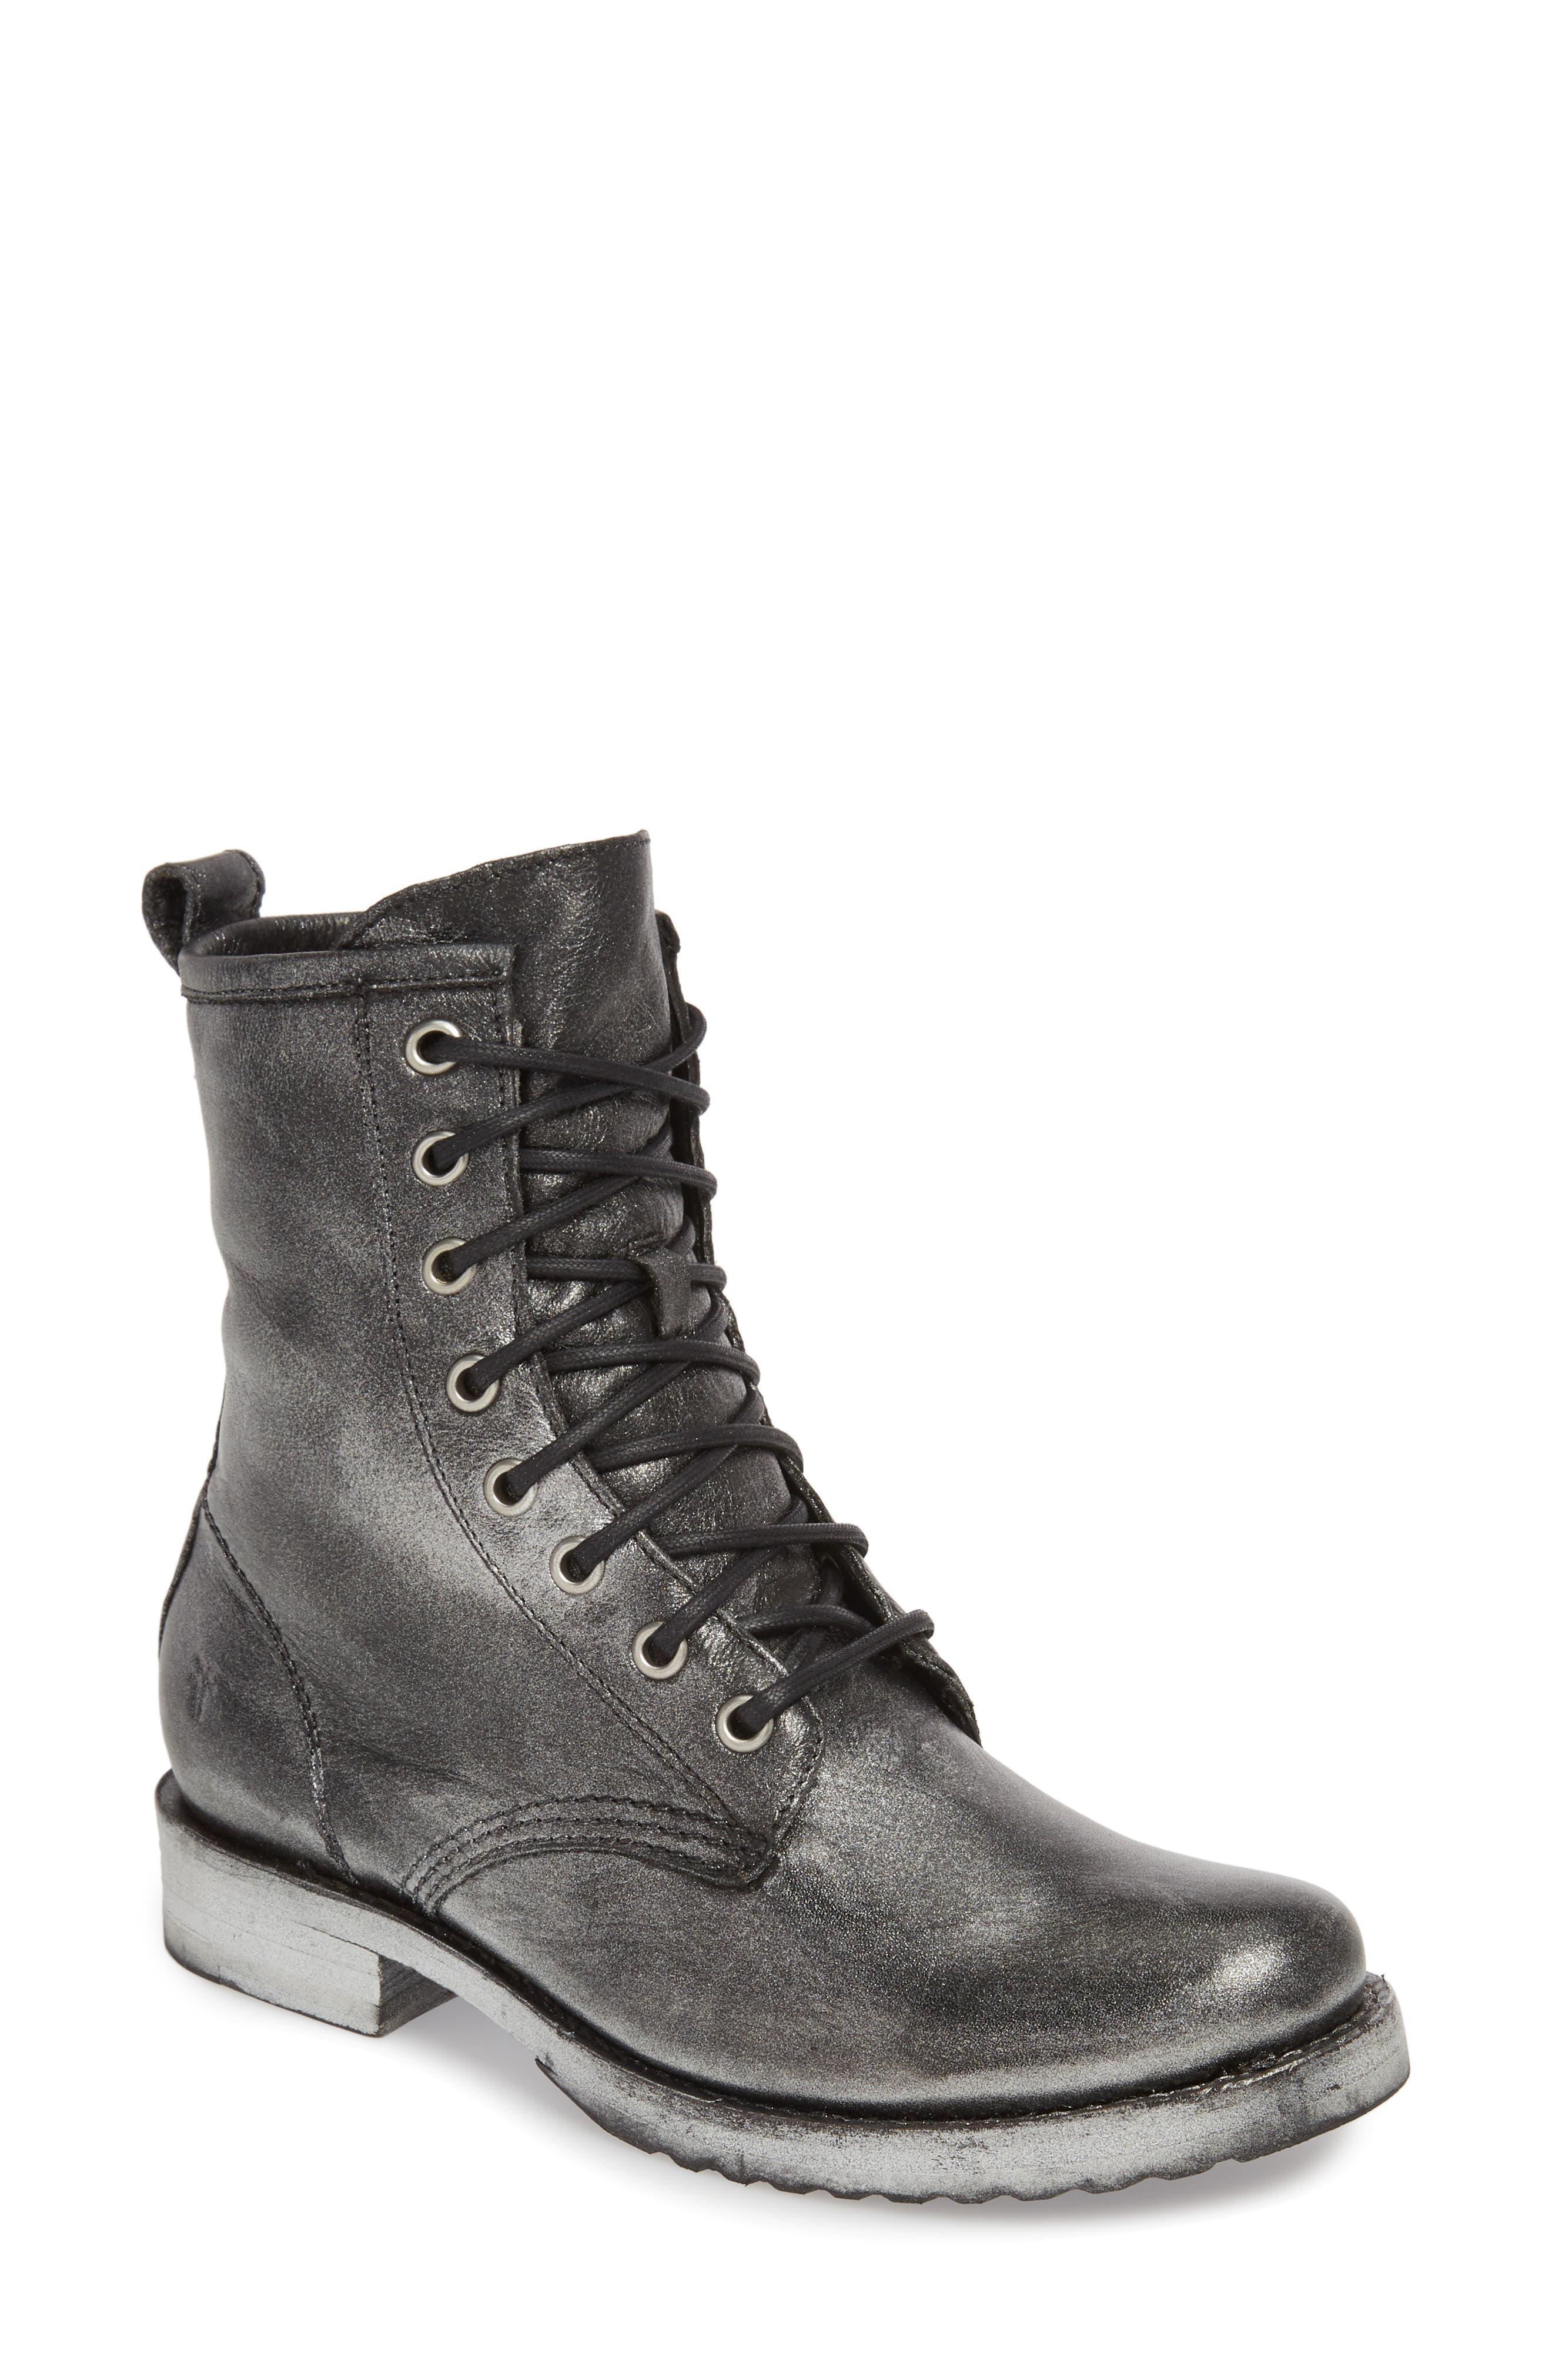 'Veronica Combat' Boot,                         Main,                         color, BLACK METALLIC LEATHER